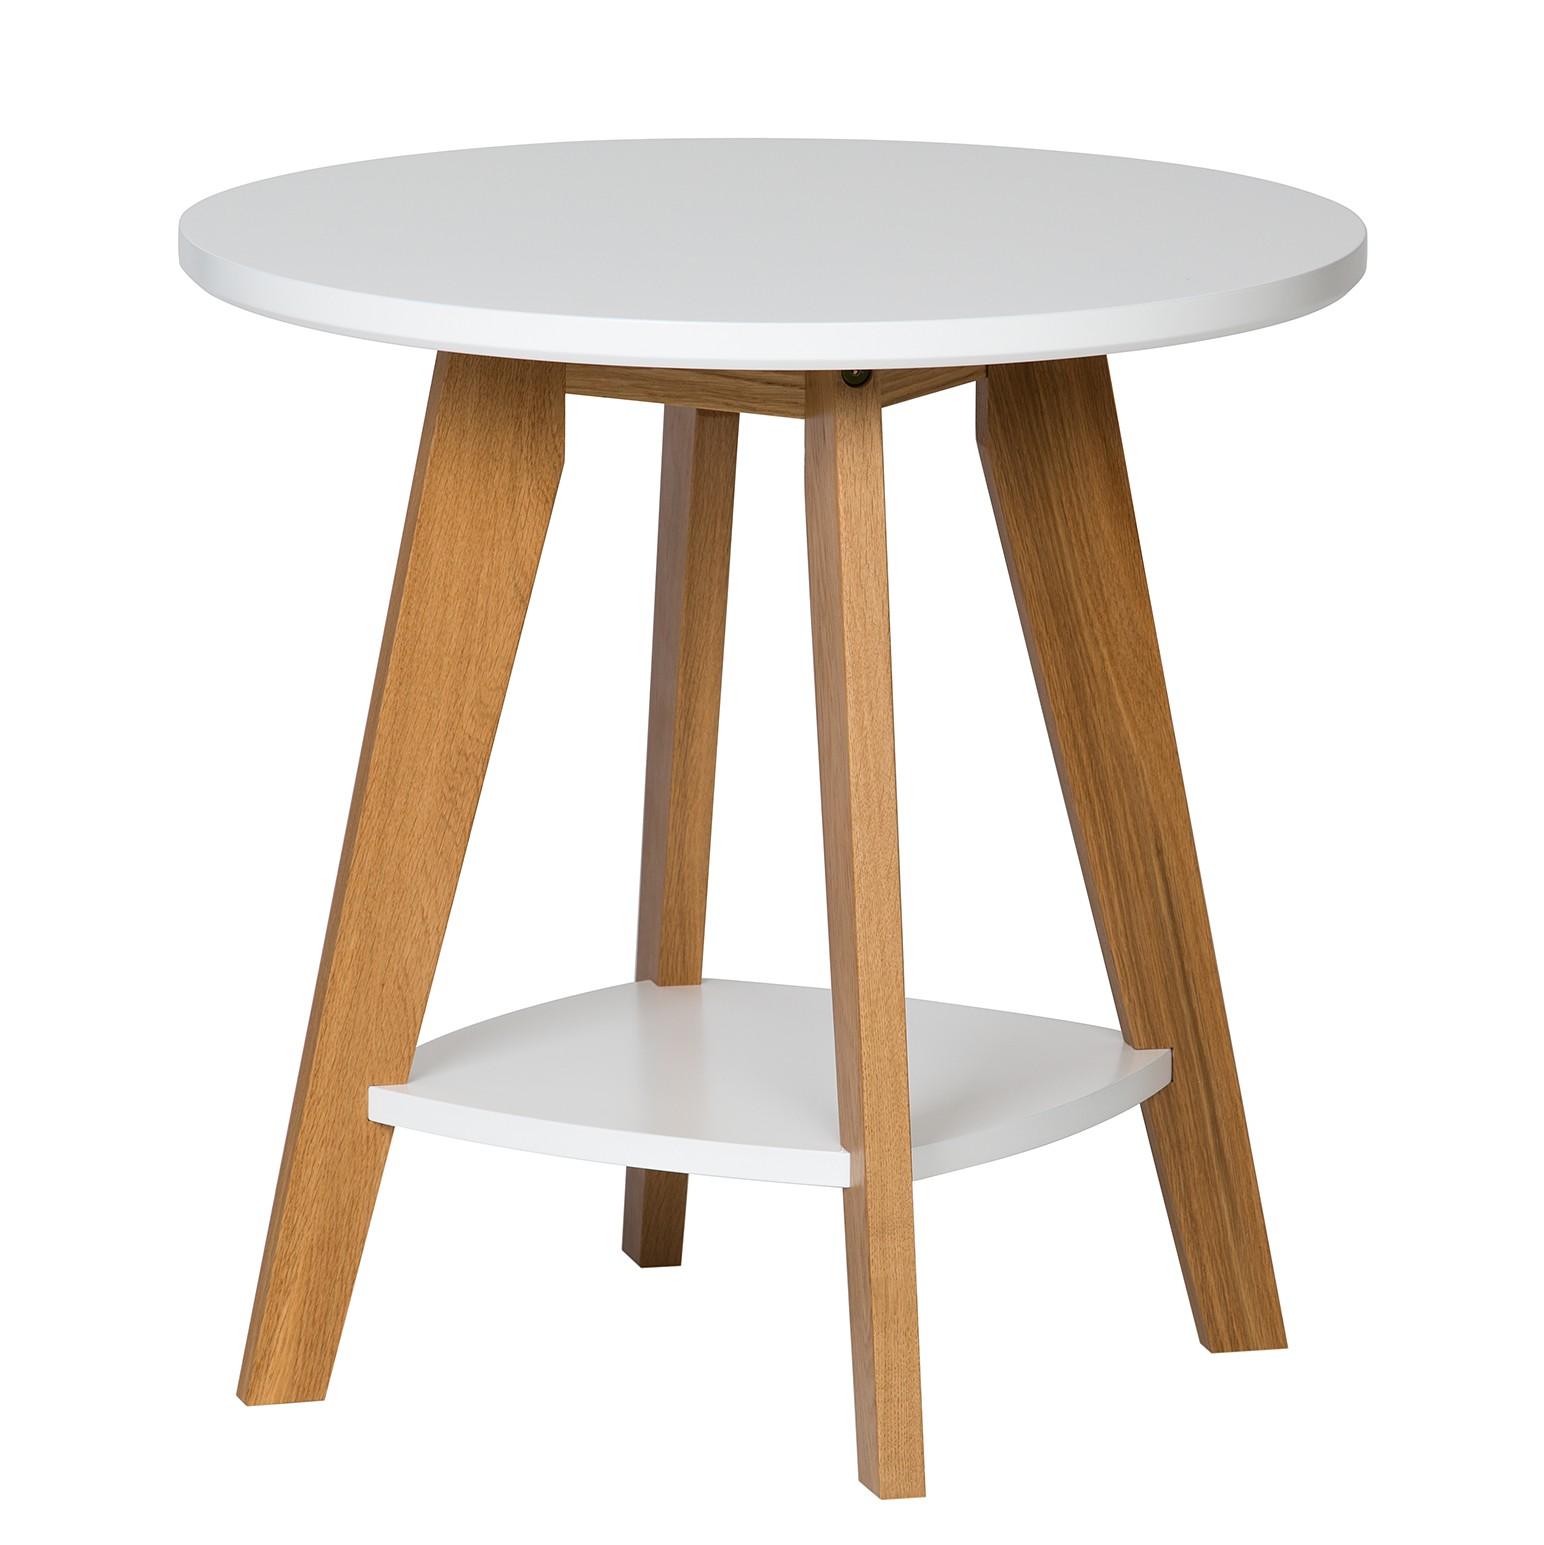 Home 24 - Table d appoint nante - chêne partiellement massif - chêne / blanc, morteens